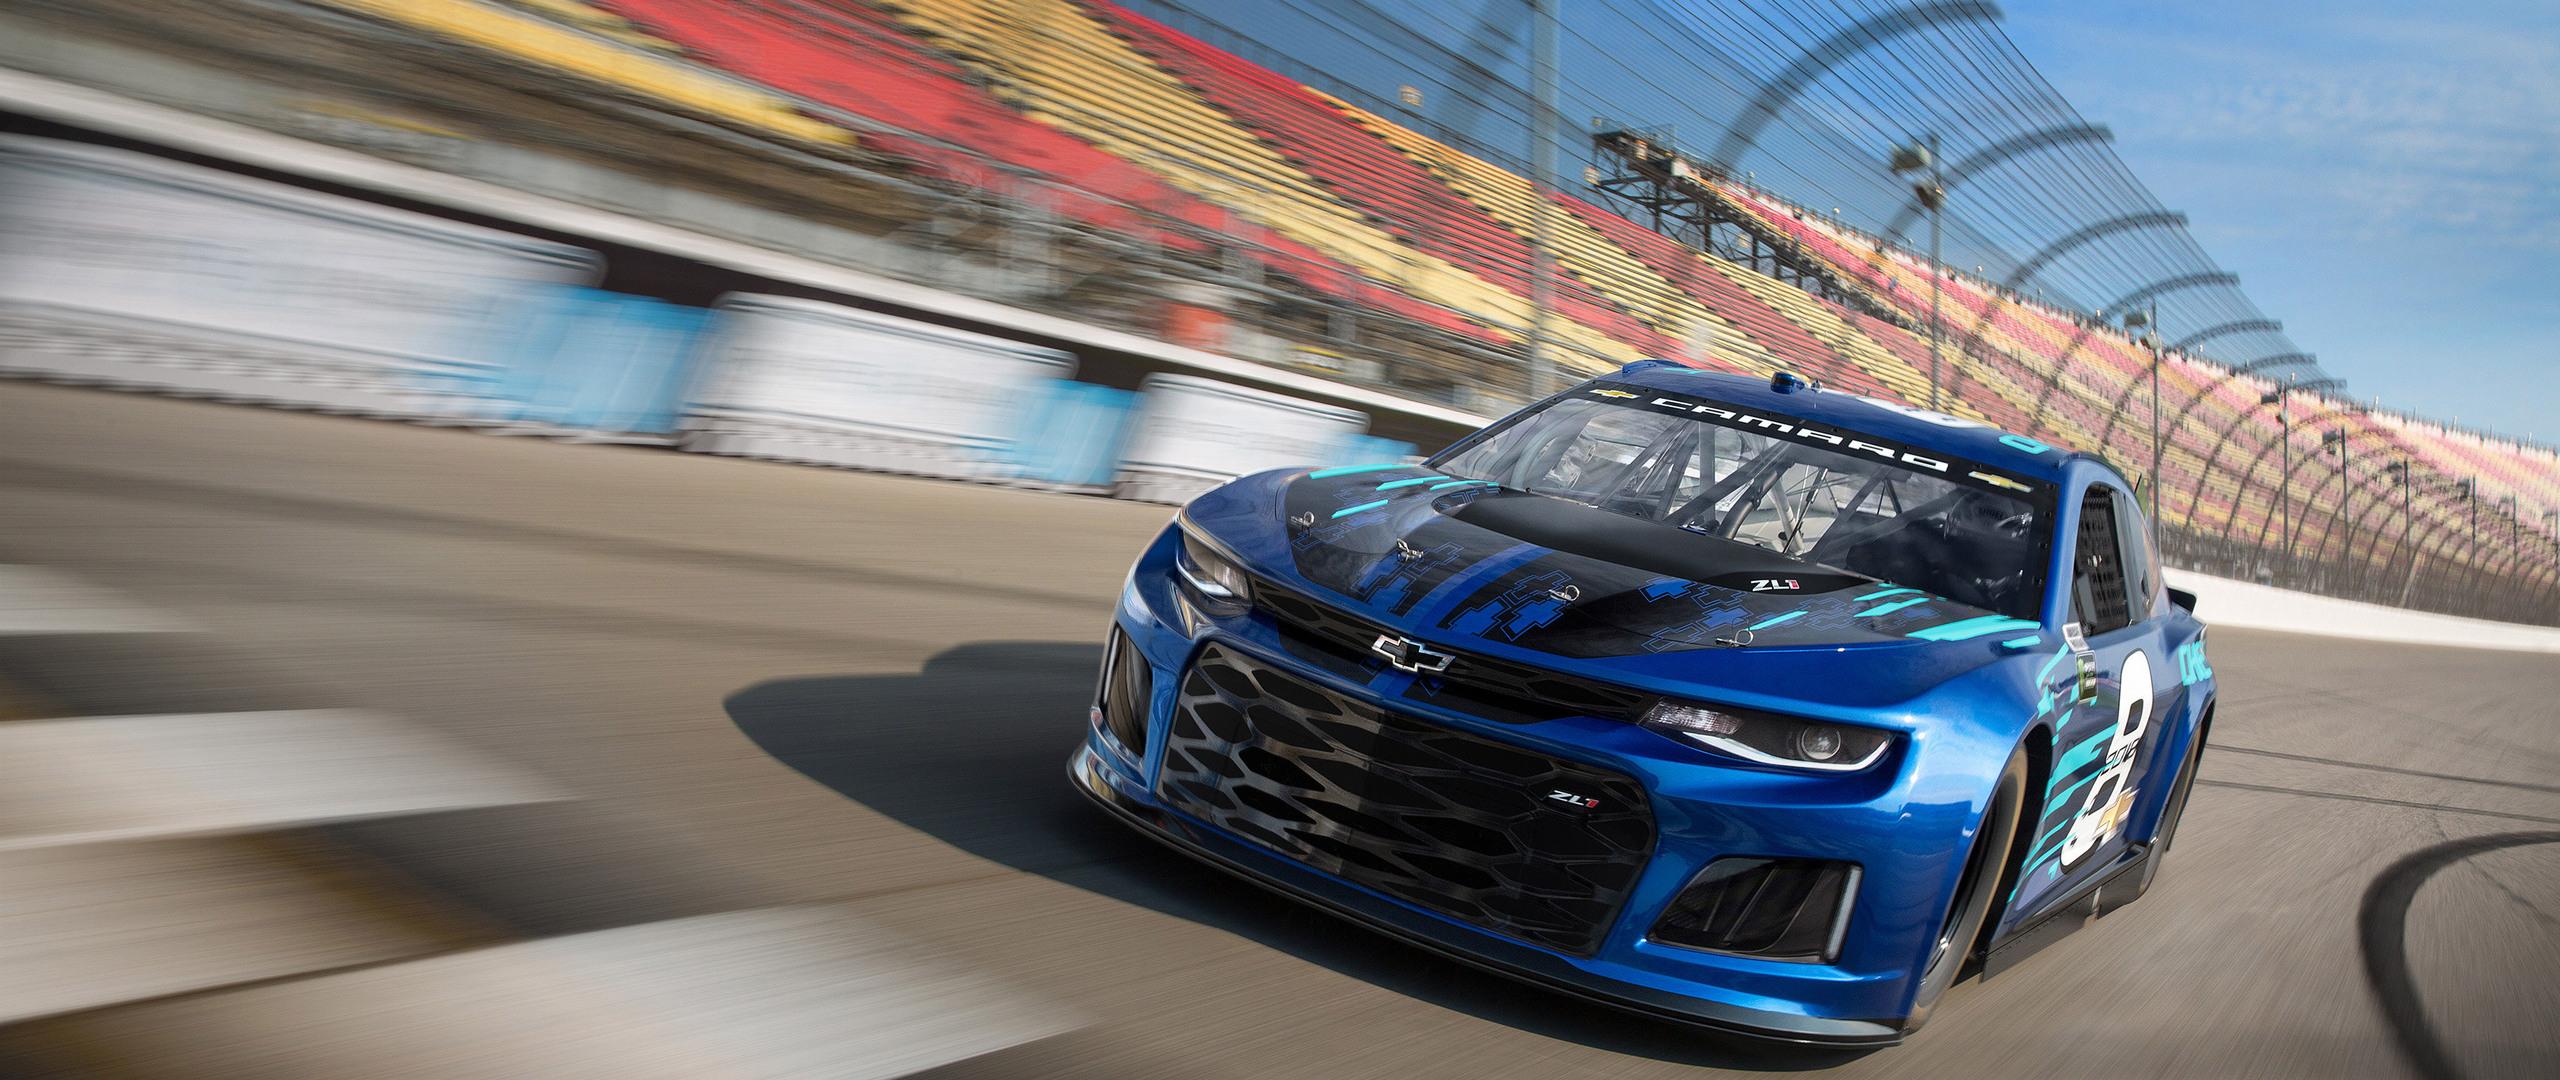 Wallpaper Chevrolet Camaro Zl1 Nascar Race Car 2017 4k: 2560x1080 Chevrolet Camaro ZL1 NASCAR 2018 2560x1080